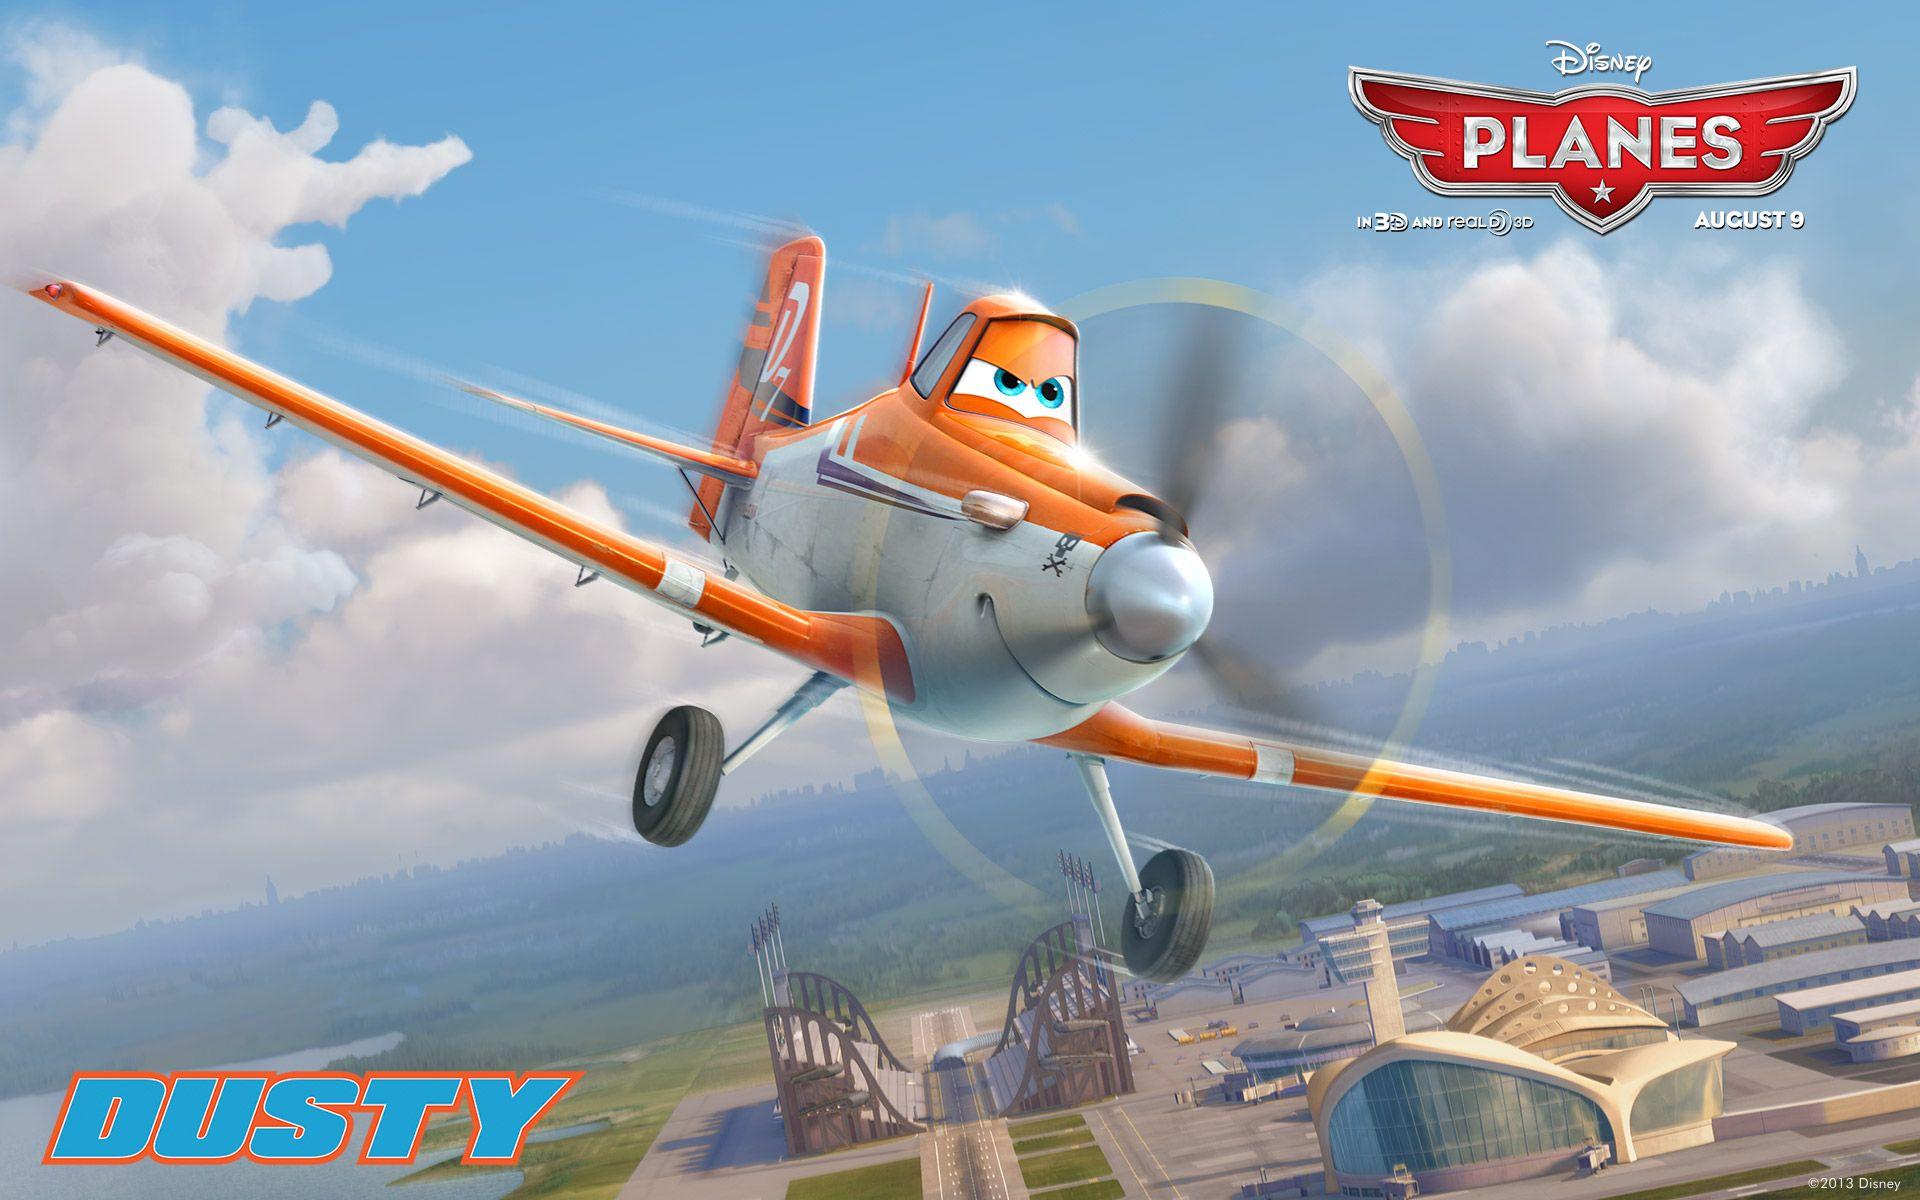 DISNEY PLANES DUSTY | Disney-Planes_Movie_Wallpaper_Dusty | Disney ...